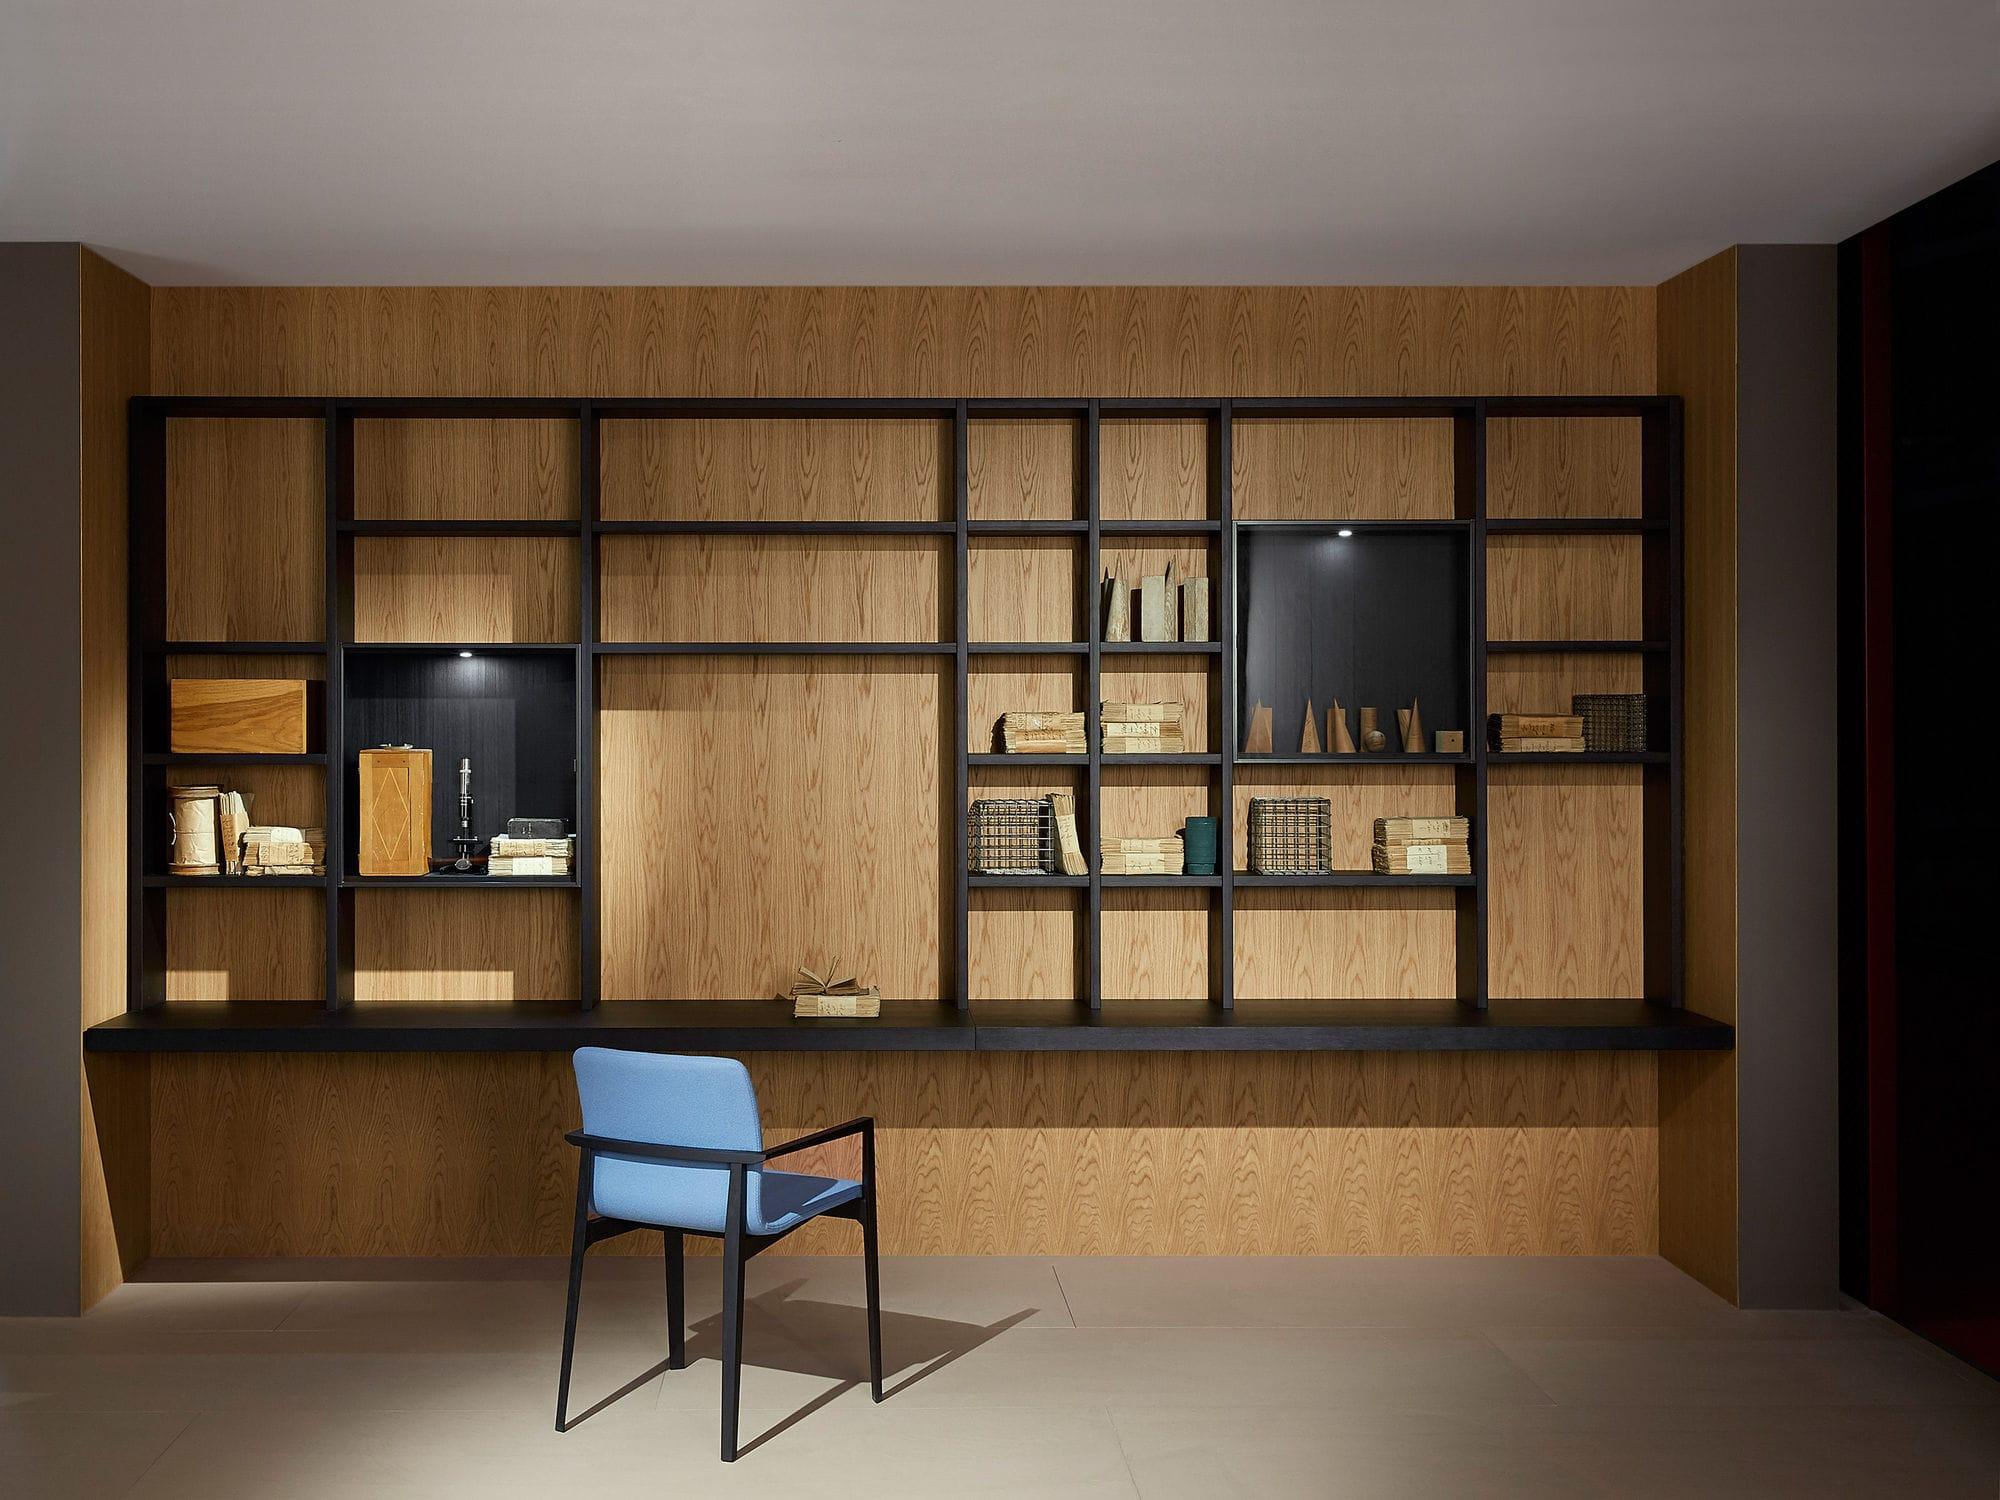 Büro design holz  Moderne Bibliothek / für Büro / lackiertes Holz / Aluminium ...